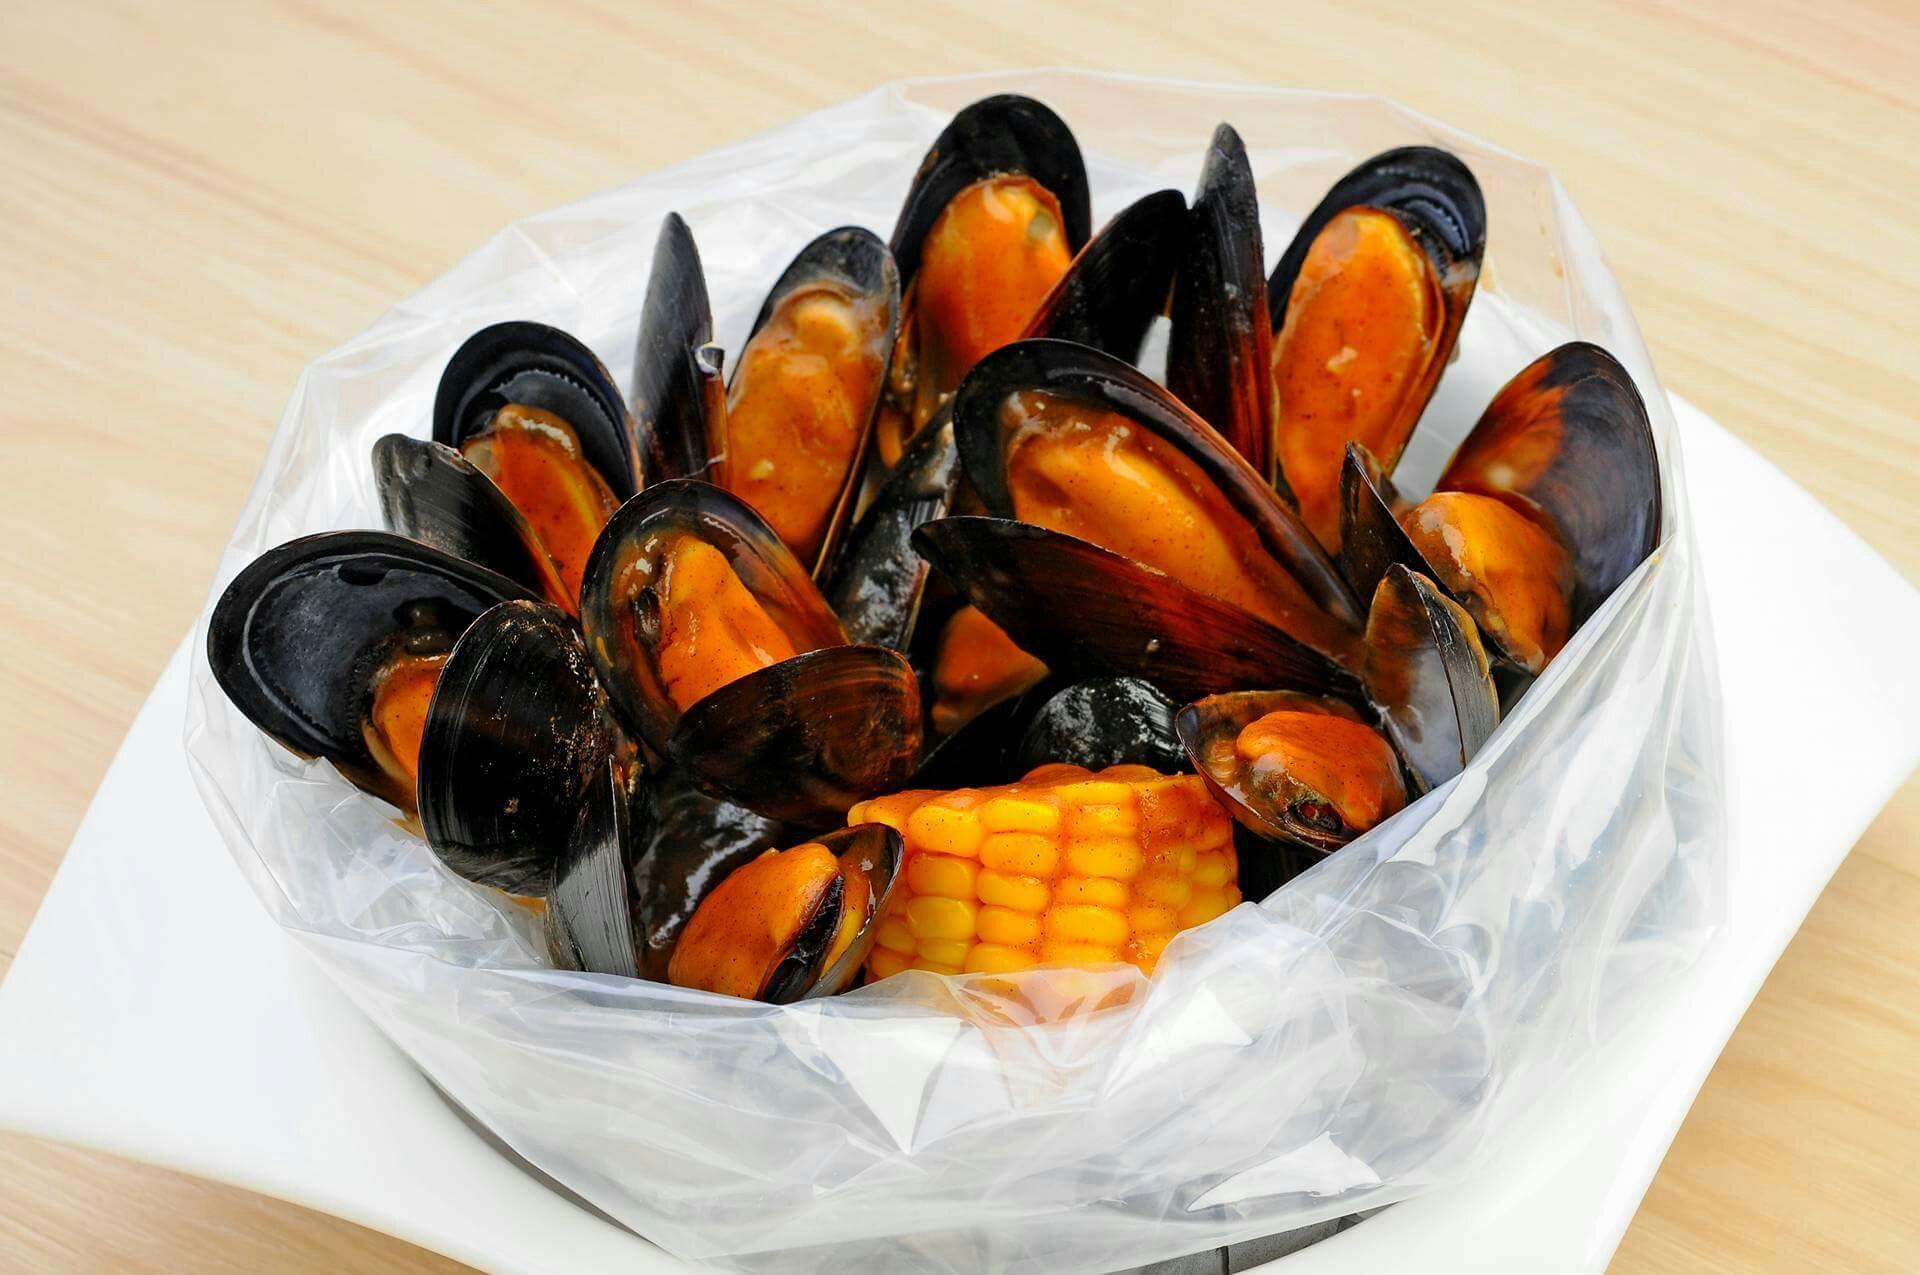 Choobi Choobi Mussels